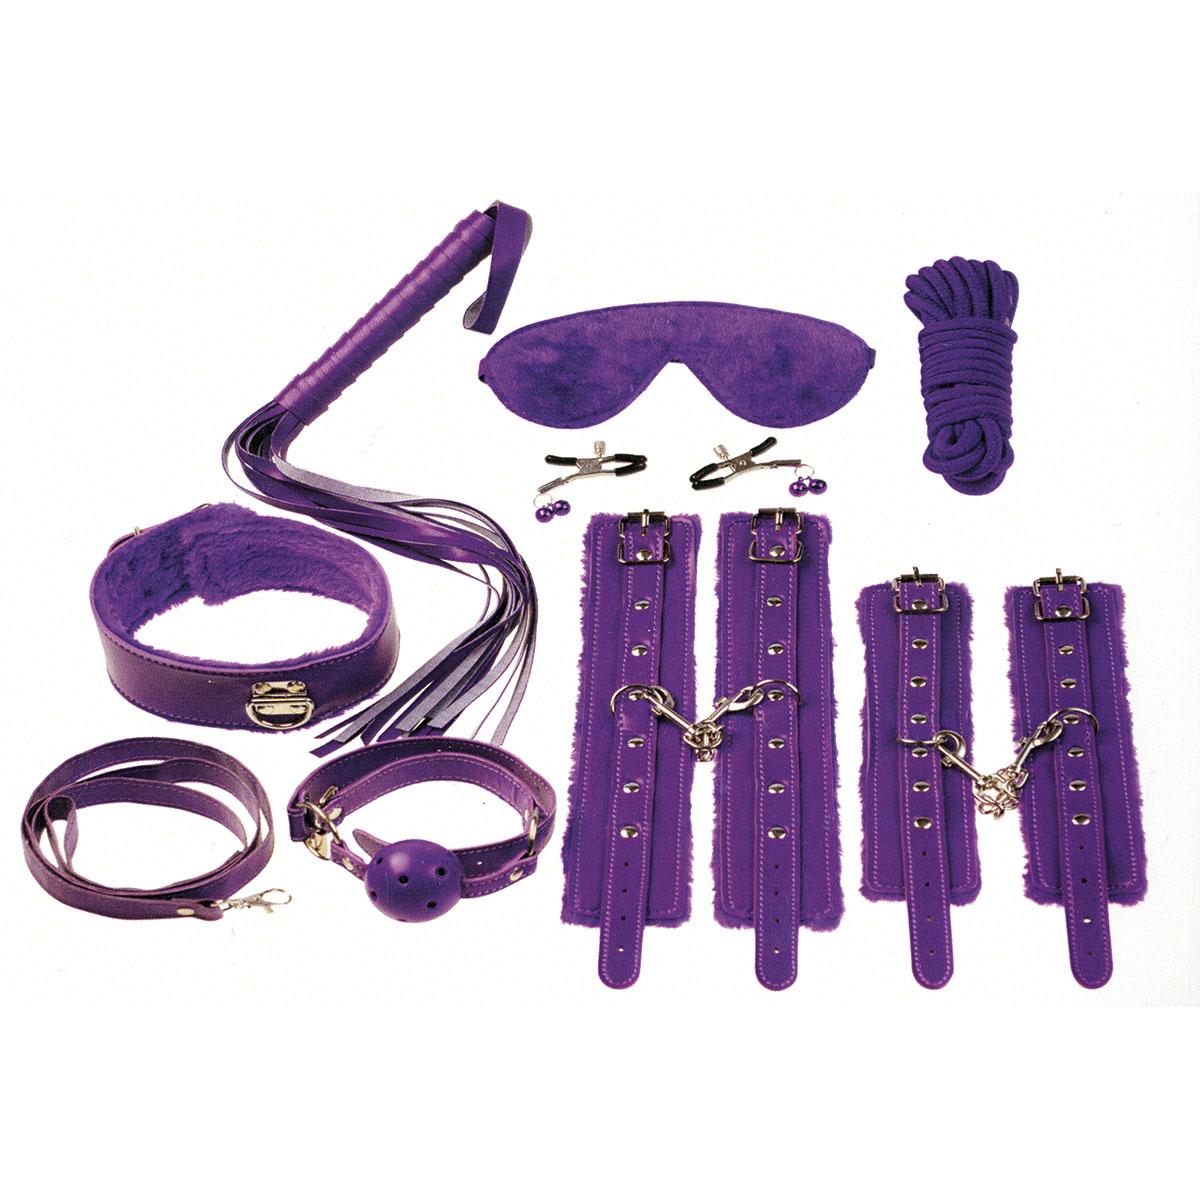 everything-bondage-kit-purple-01-1200x1200.jpg